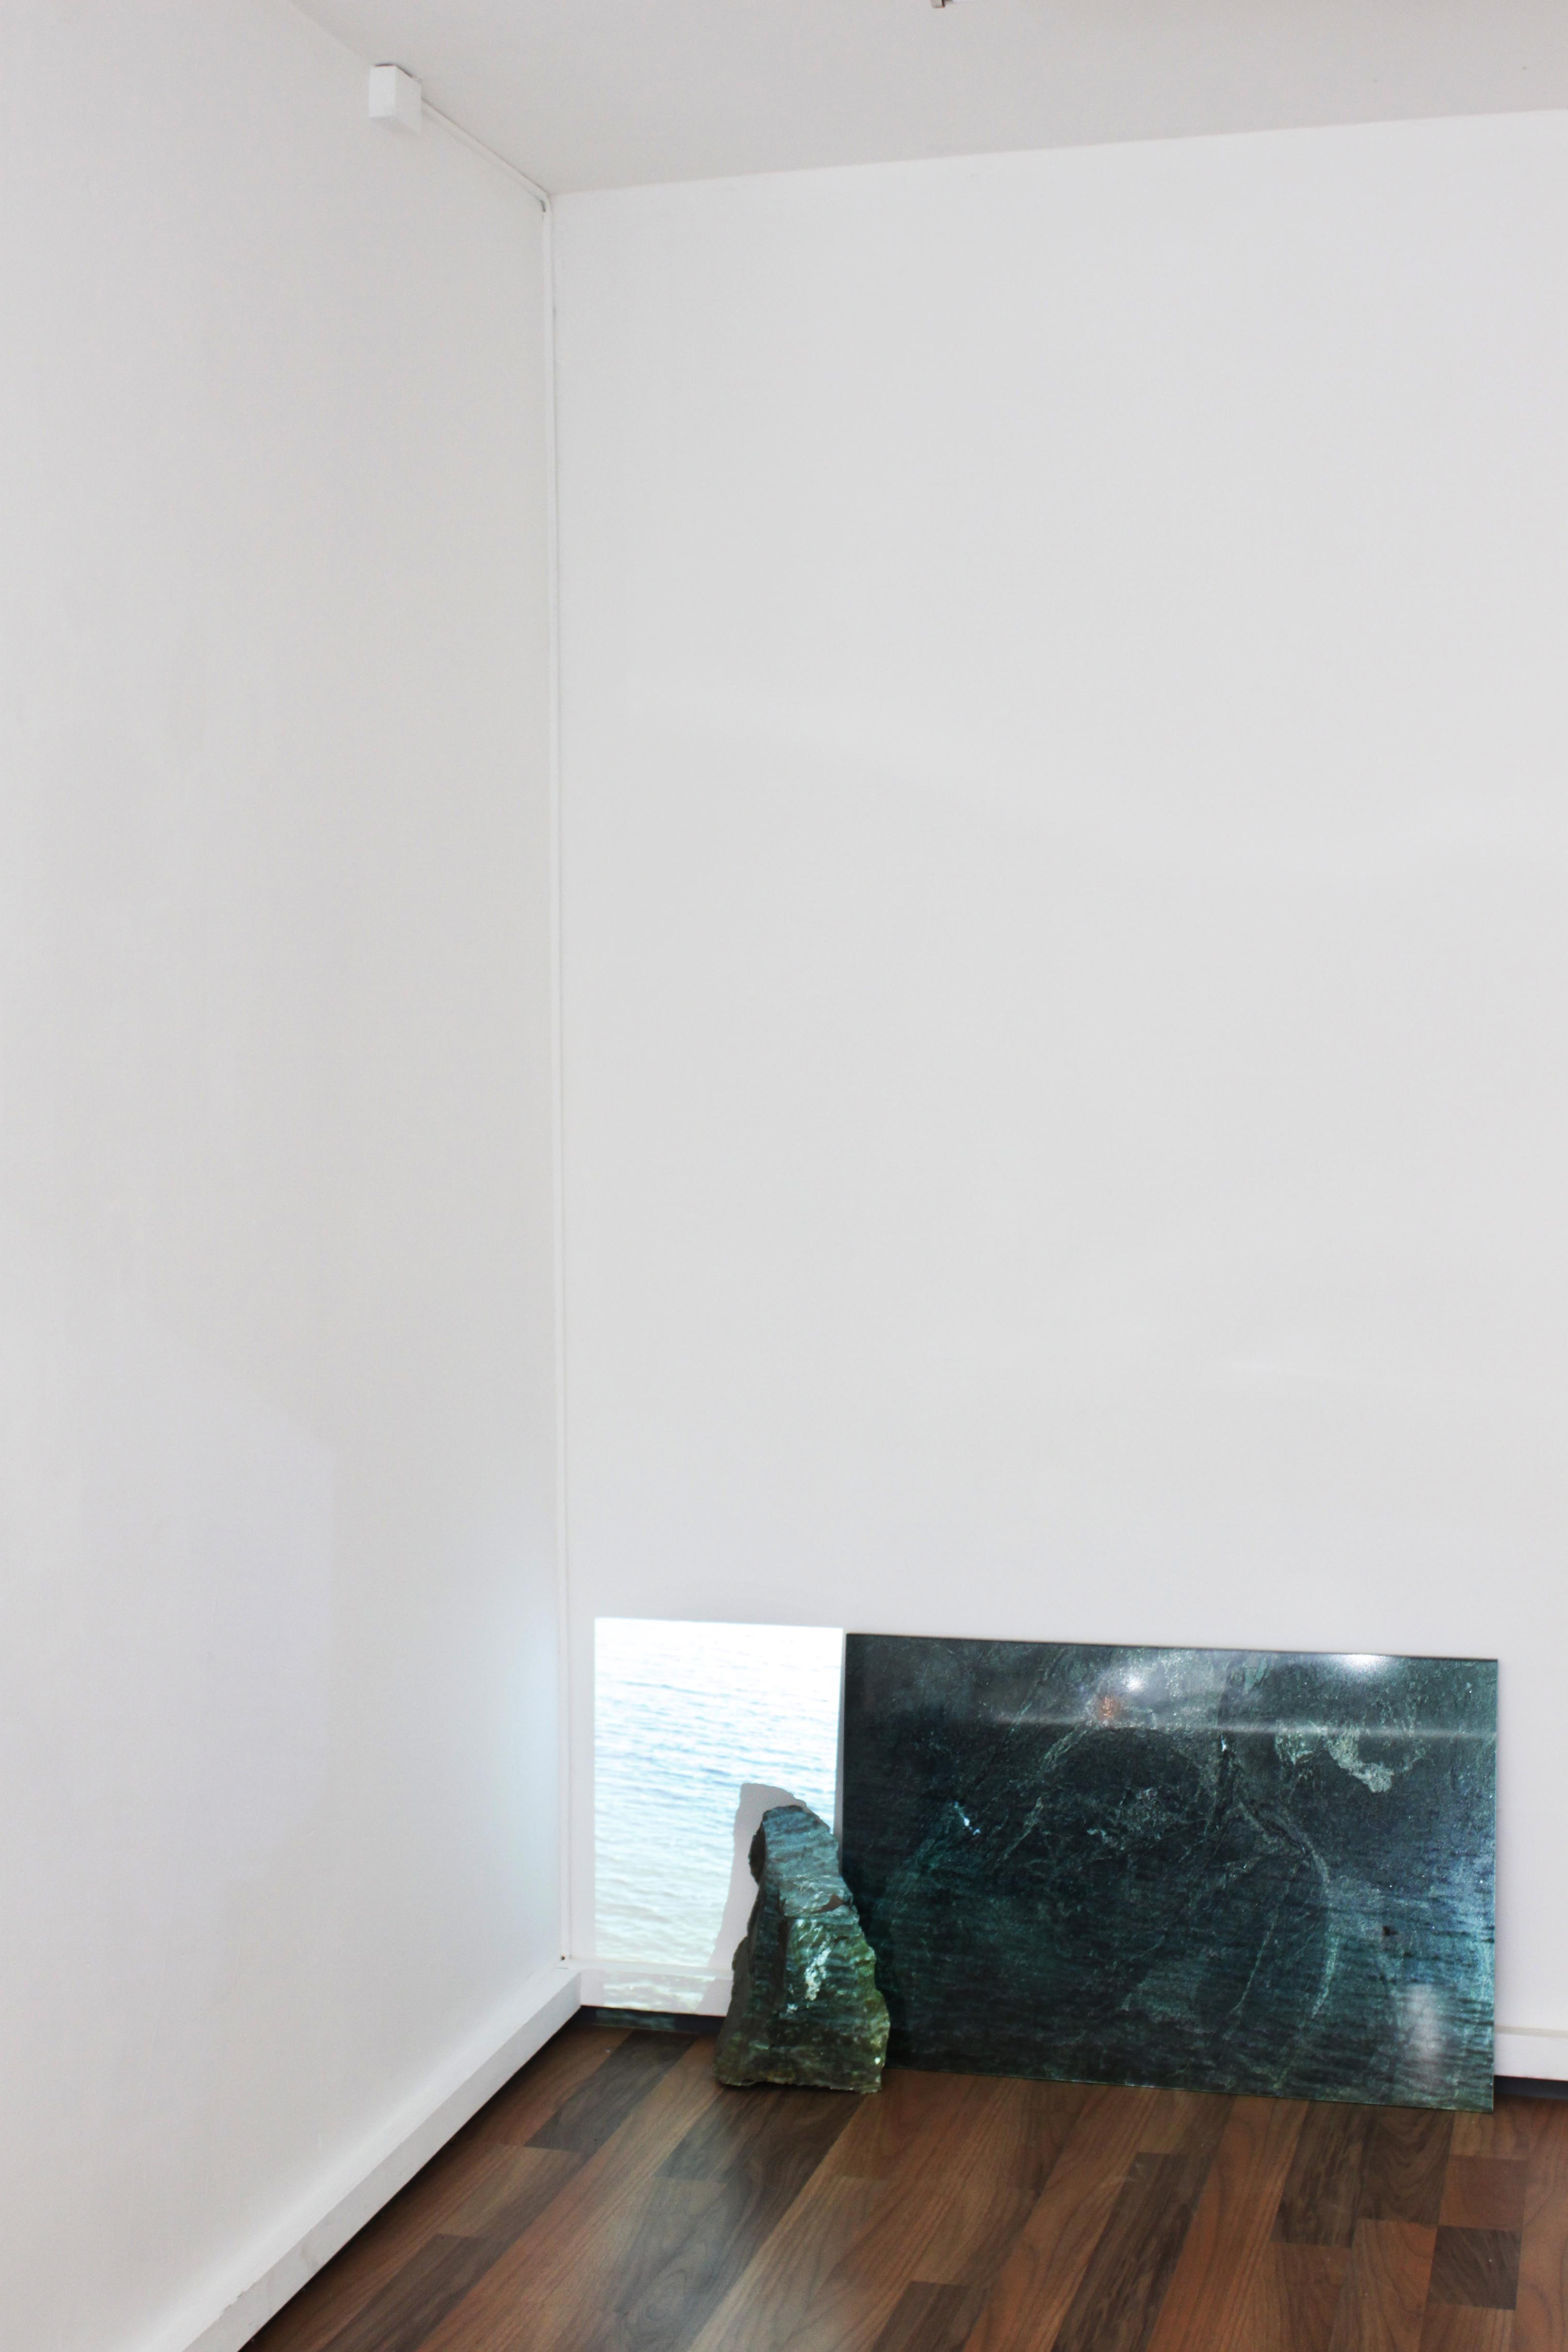 Jardin Sec Urgent Paradise Gallery Lausanne 2014 Assi Joseph